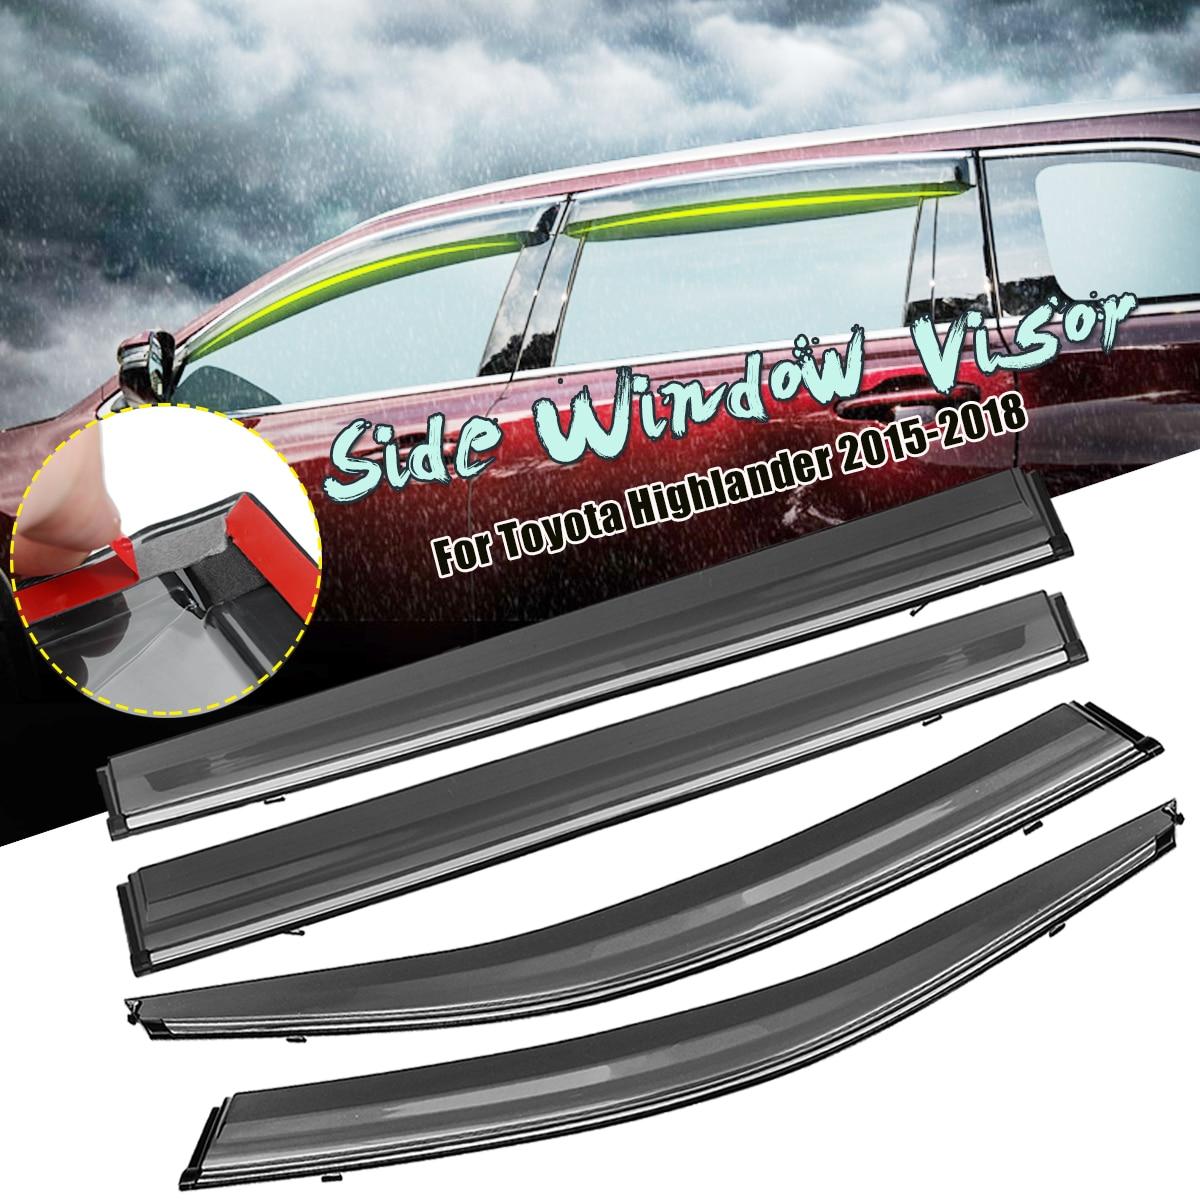 4pcs acrylic side window visor rain sun guard vent shade for toyota highlander 2015 2016 2017 [ 1200 x 1200 Pixel ]